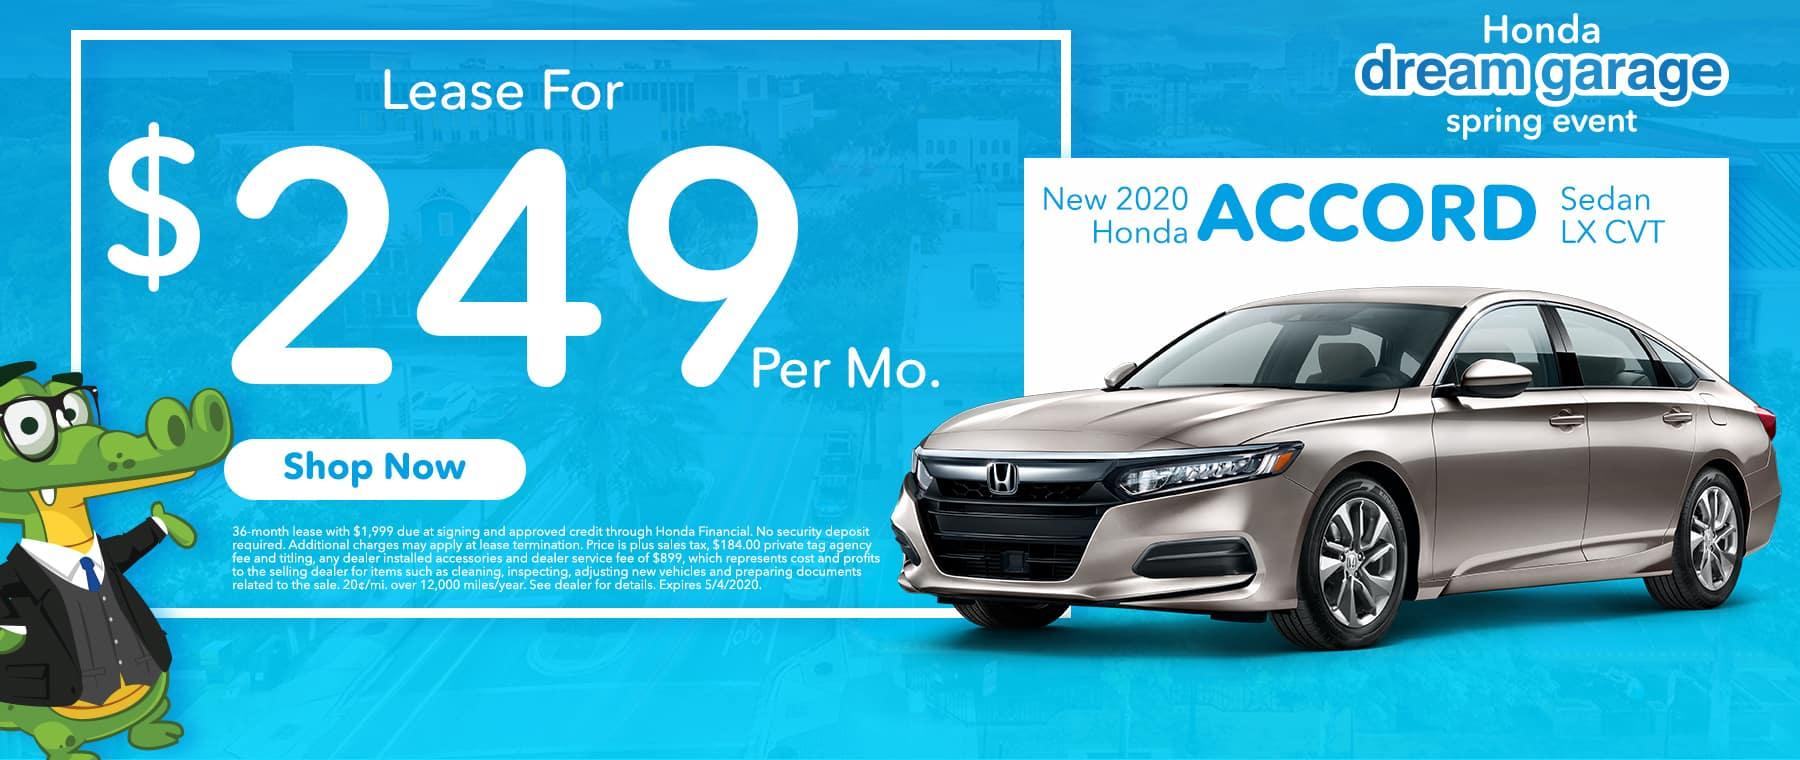 New 2020 Hond Accord Sedan LX CVT | Lease For $249 Per Mo | Honda Dream Garage Spring Event